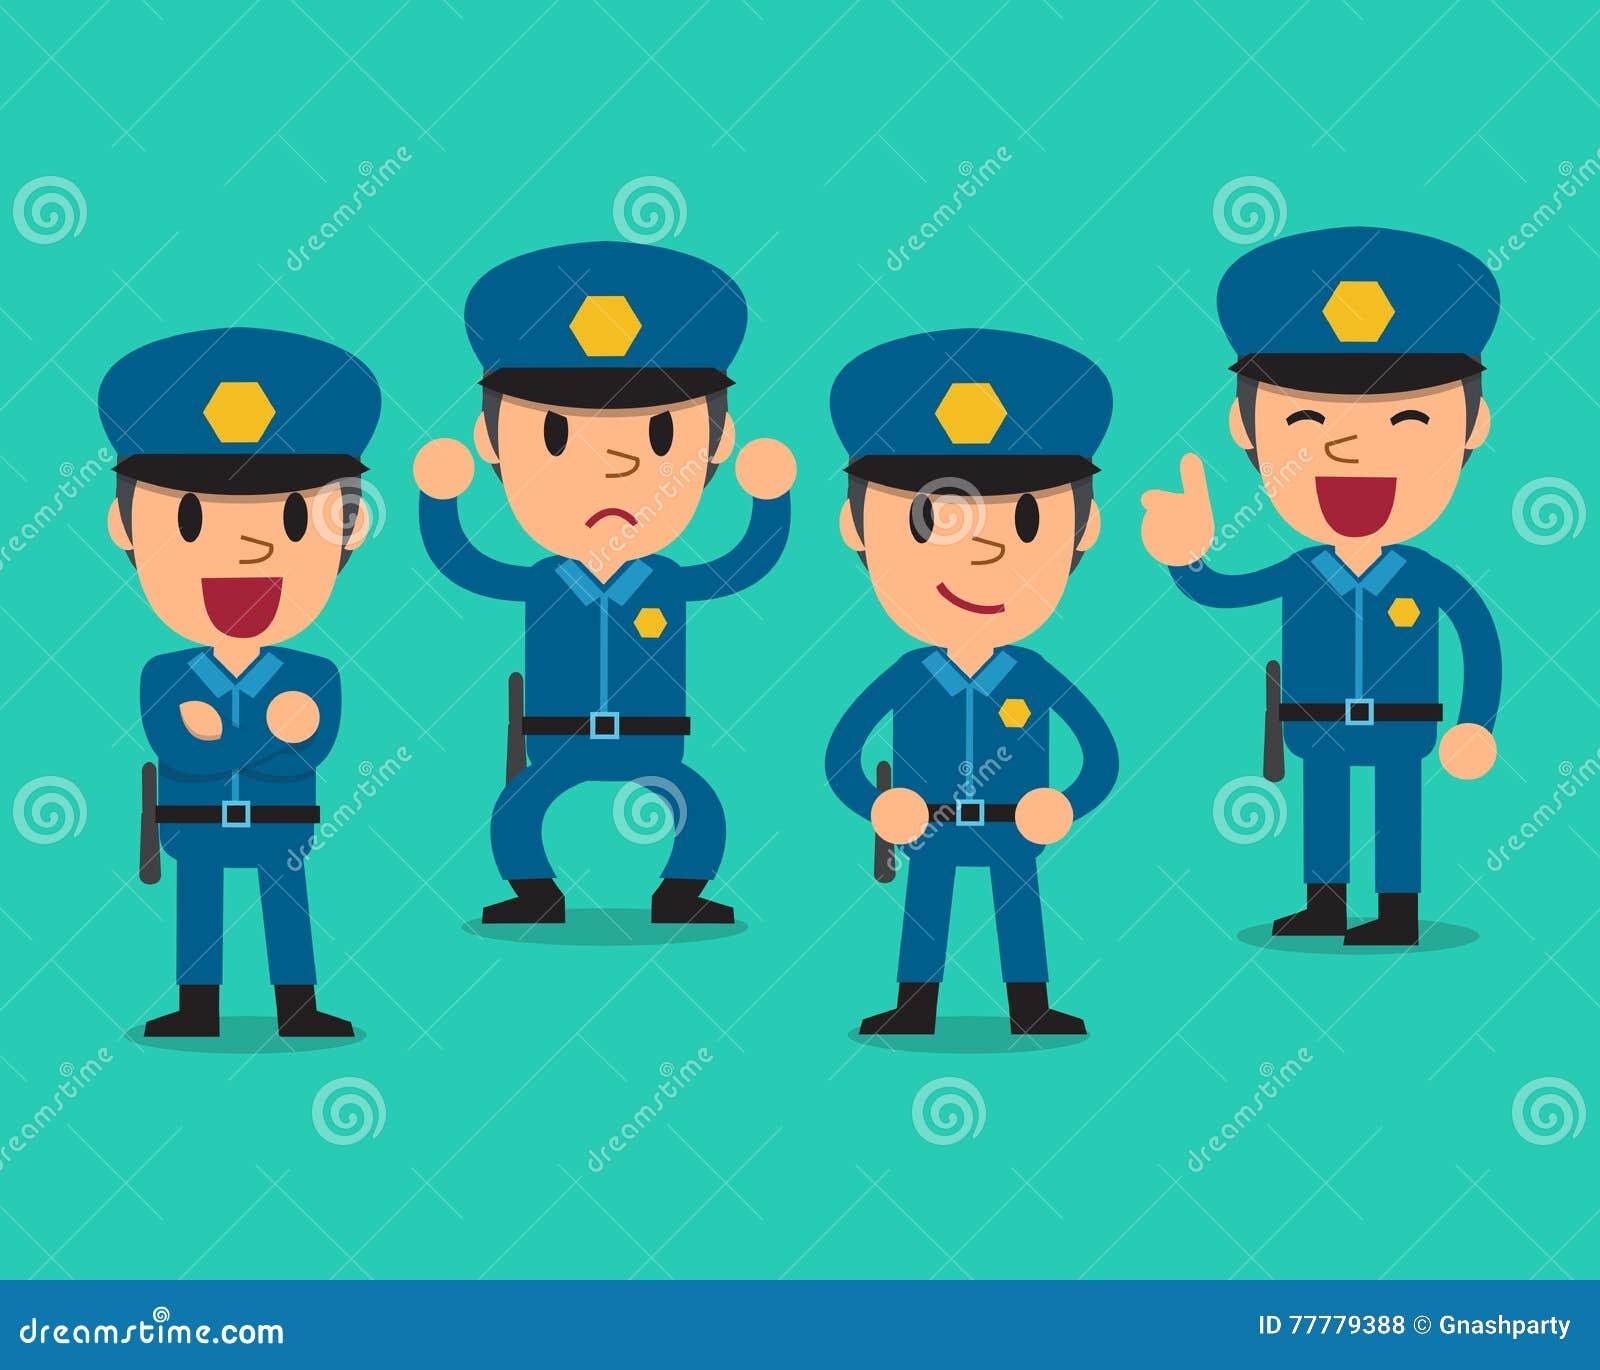 Character Design Artist Job Description : Cartoon policeman character poses vector